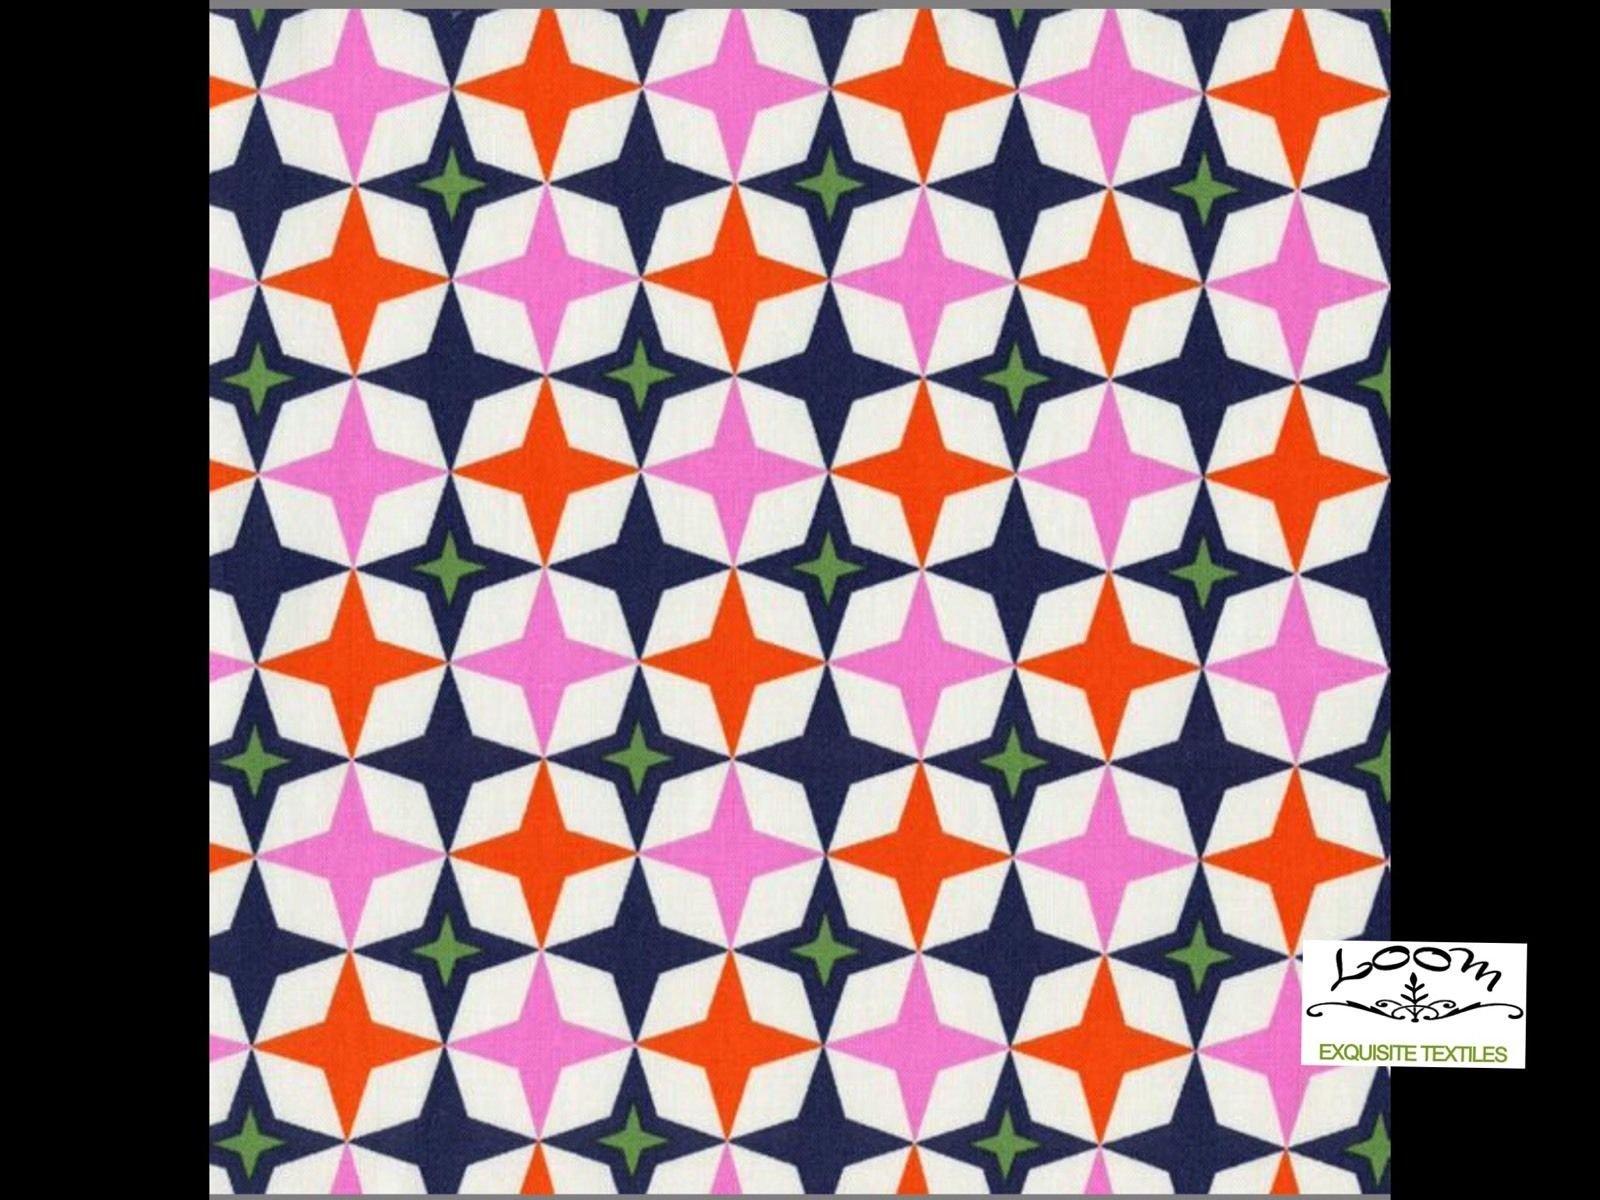 Cotton + Steel Miller Retro Atomic Starburst Mod Playful Games Cotton Quilting Fabric CTN23